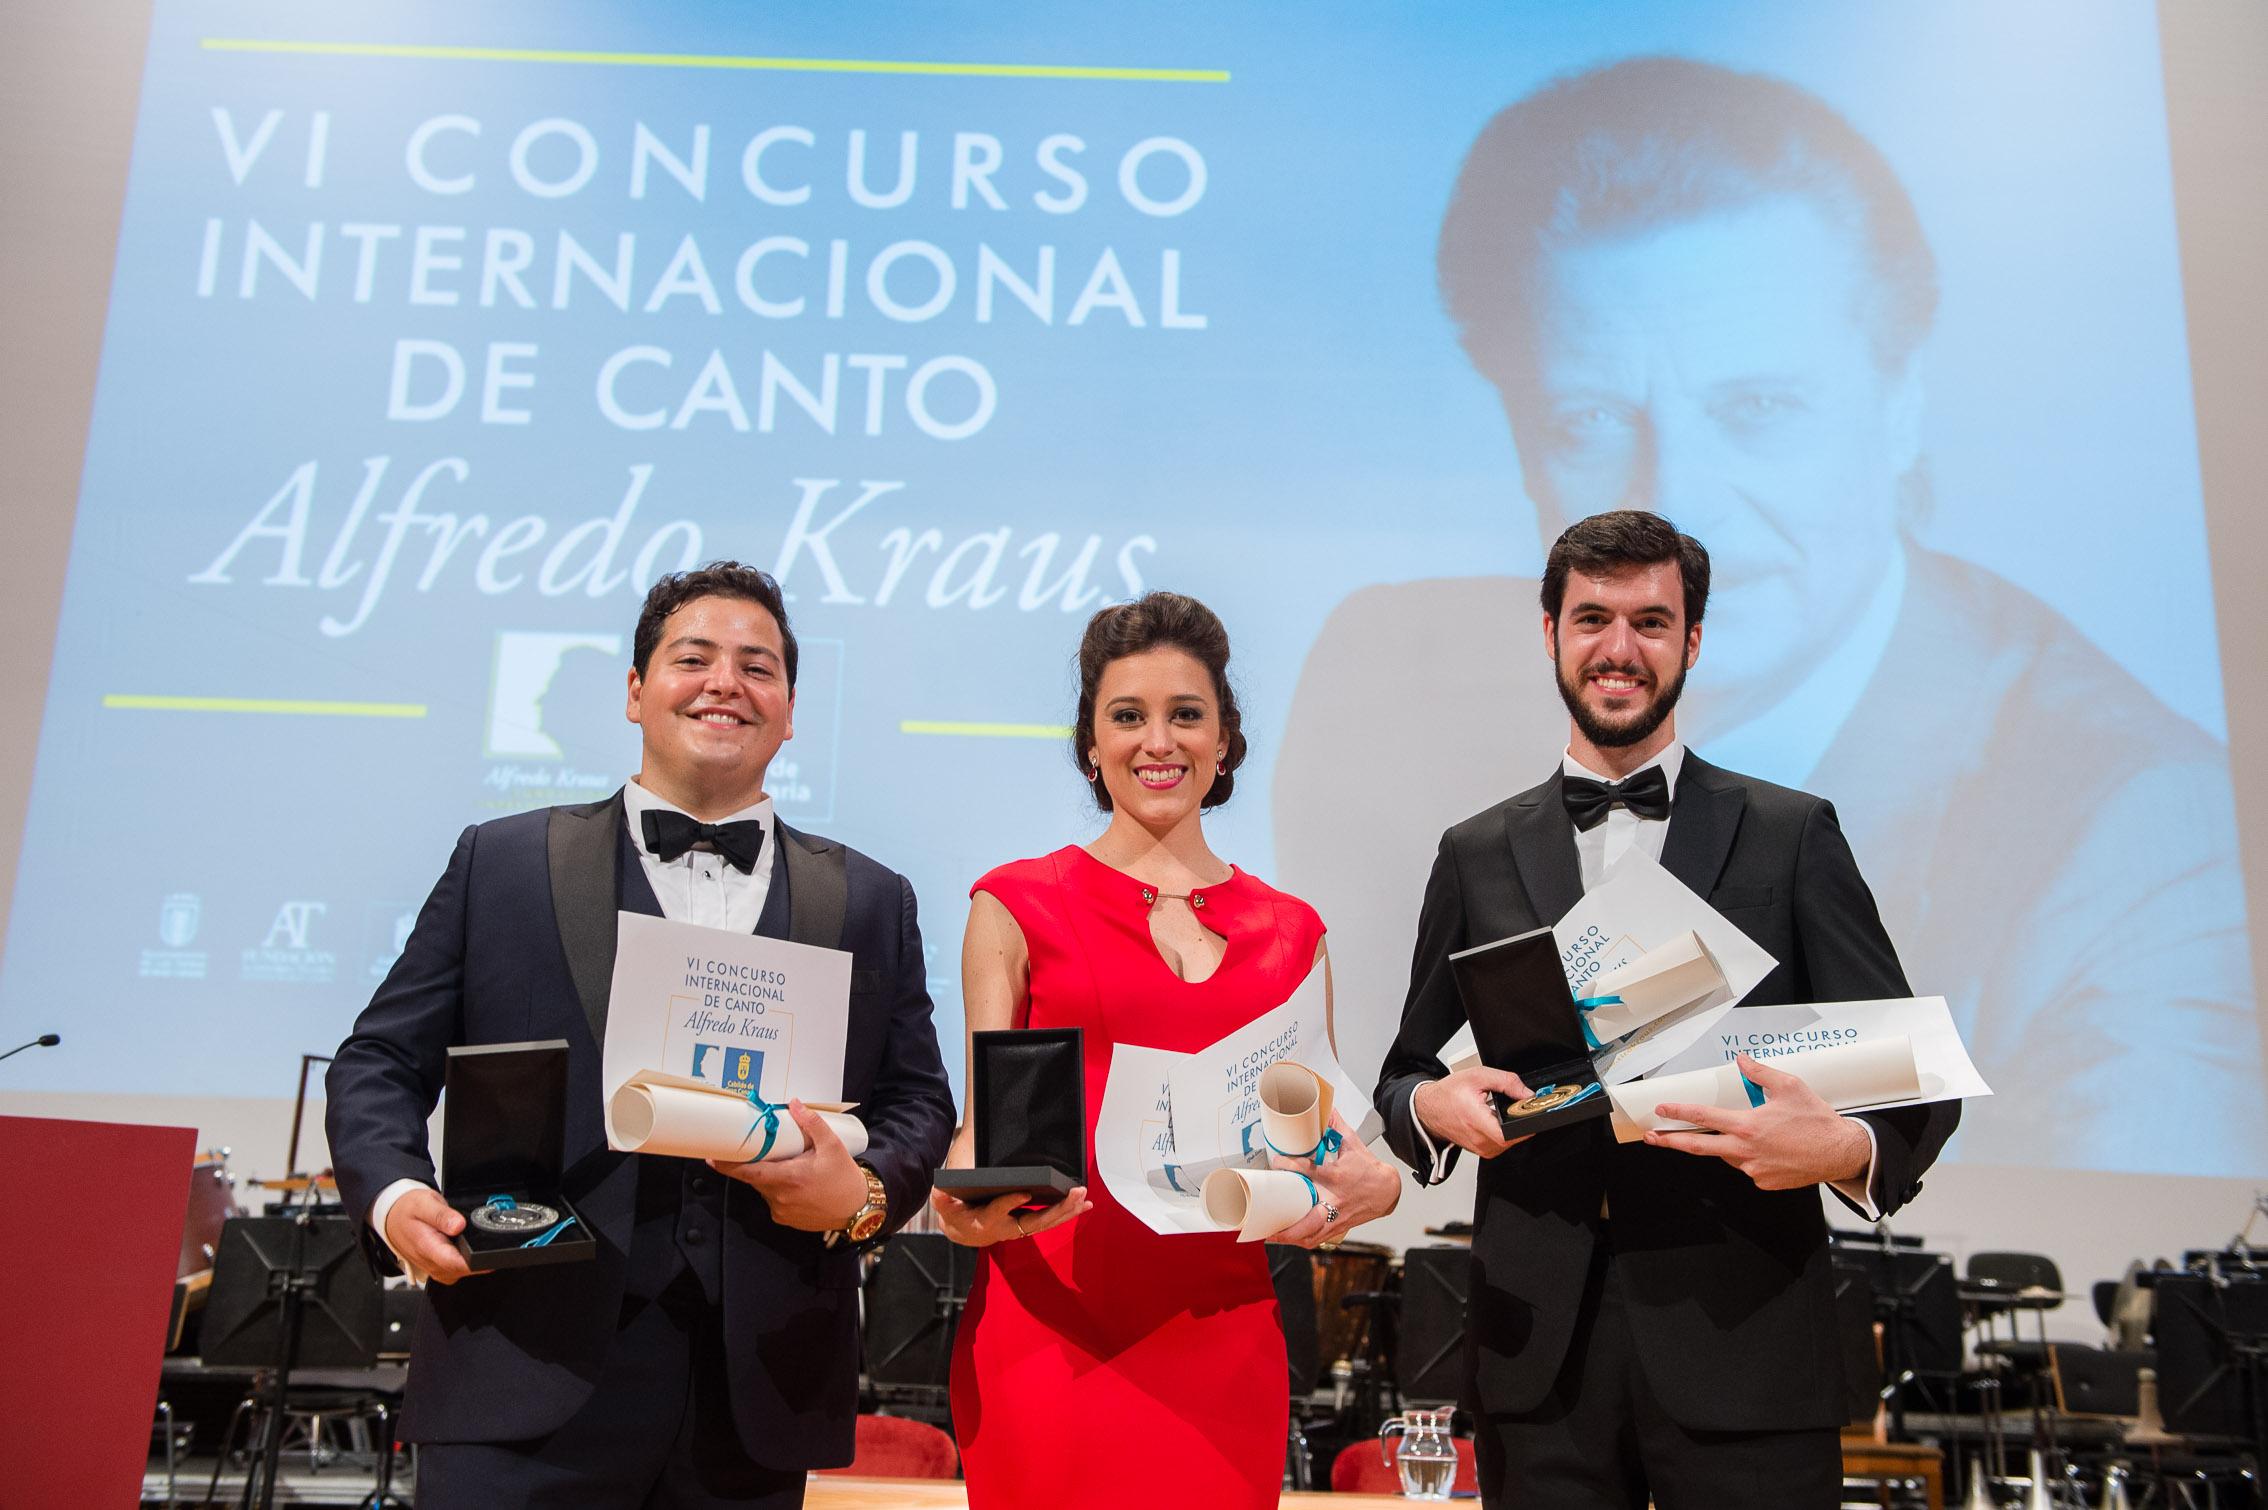 Premiados del VI Concurso Internacional De Canto Alfredo Kraus. ©Nacho González/CICAK